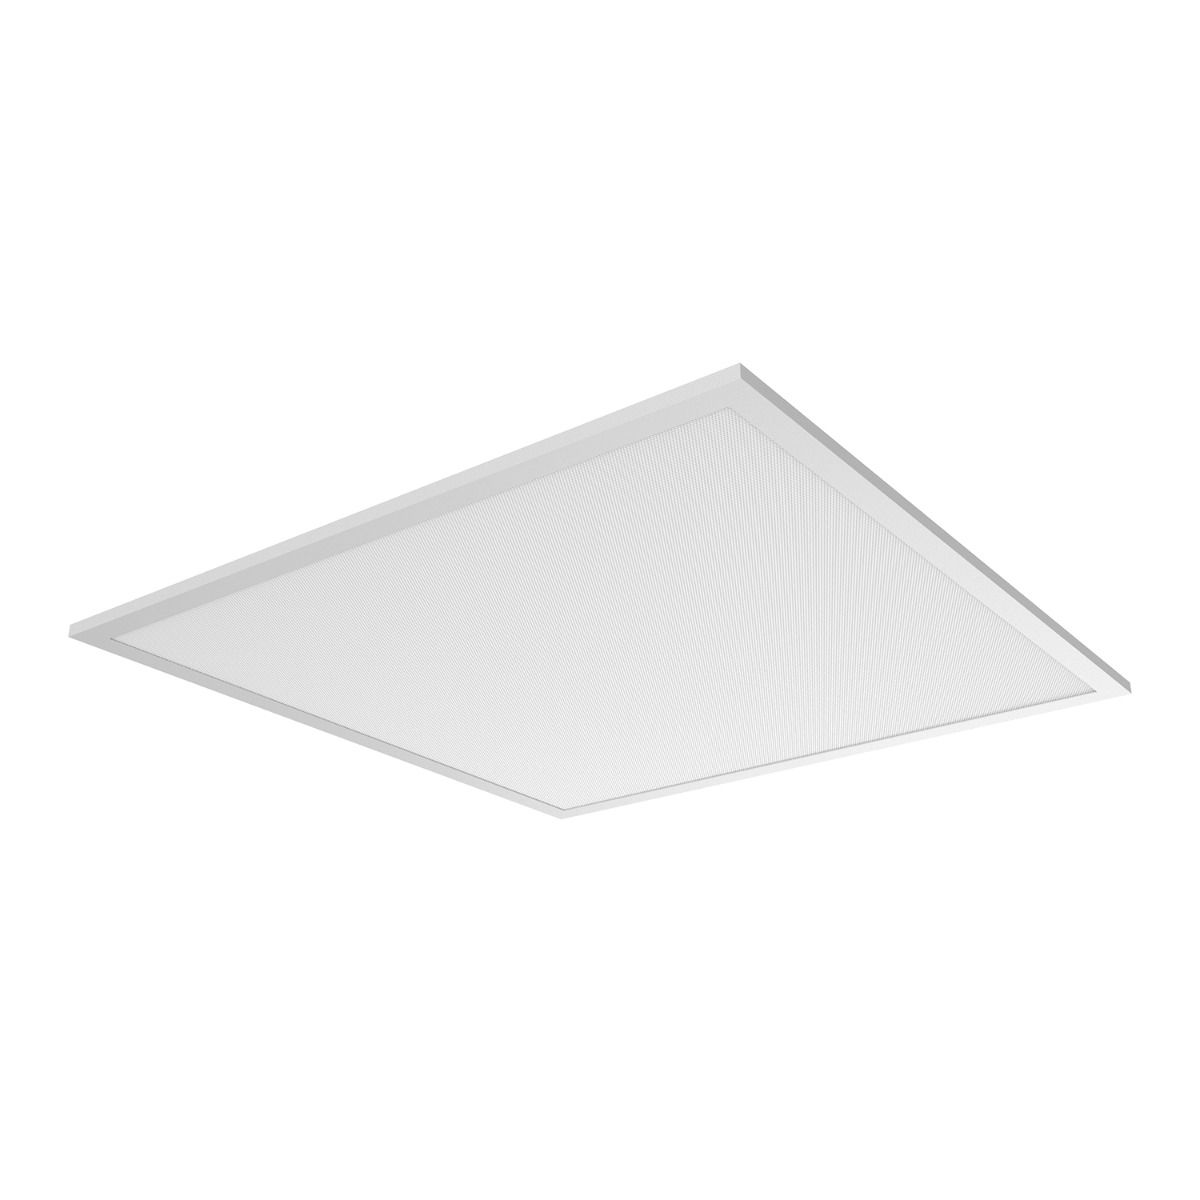 Noxion Panel LED Delta Pro V3 30W 3000K 3960lm 60x60cm UGR <19 | Luz Cálida - Reemplazo 4x18W